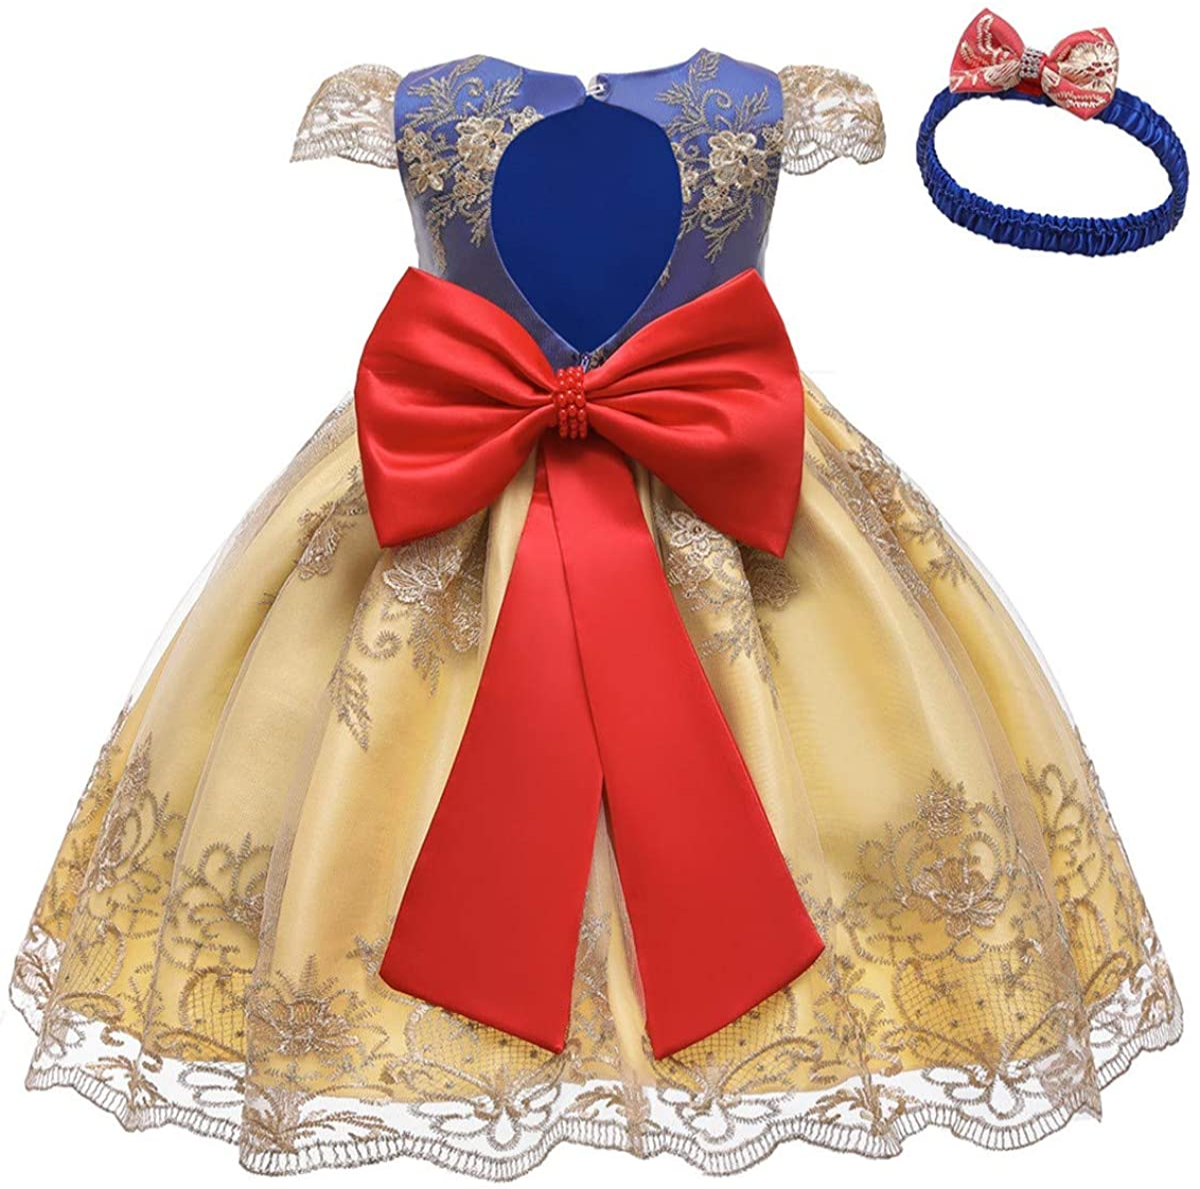 HOIZOSG Baby Girls Christening online shop Dress Wedding Party Ranking TOP16 Kids Birthday